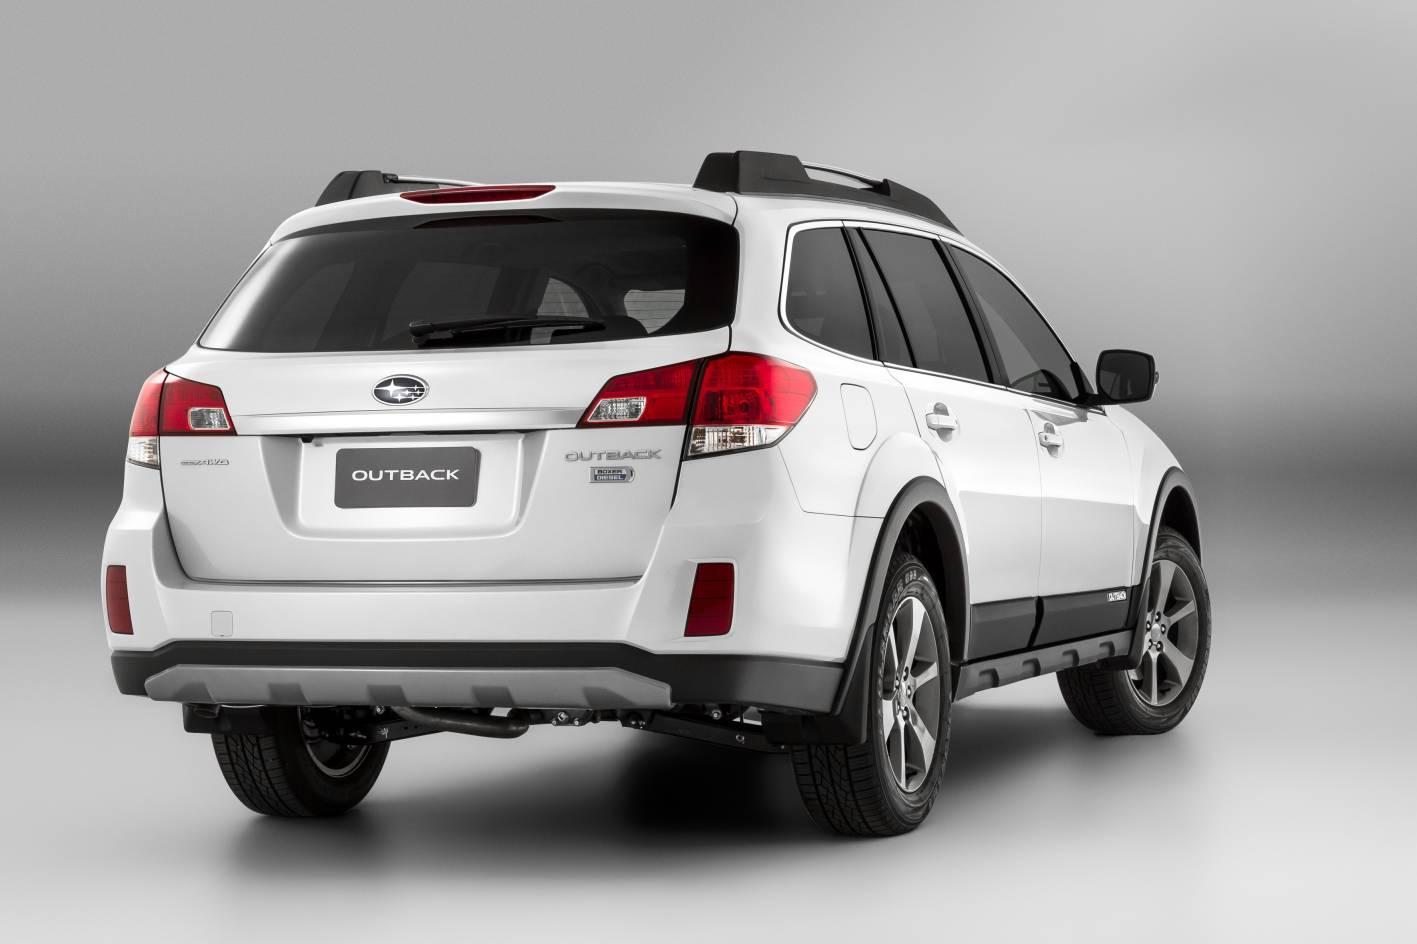 Subaru Cars News Subaru Updates 2014 Outback